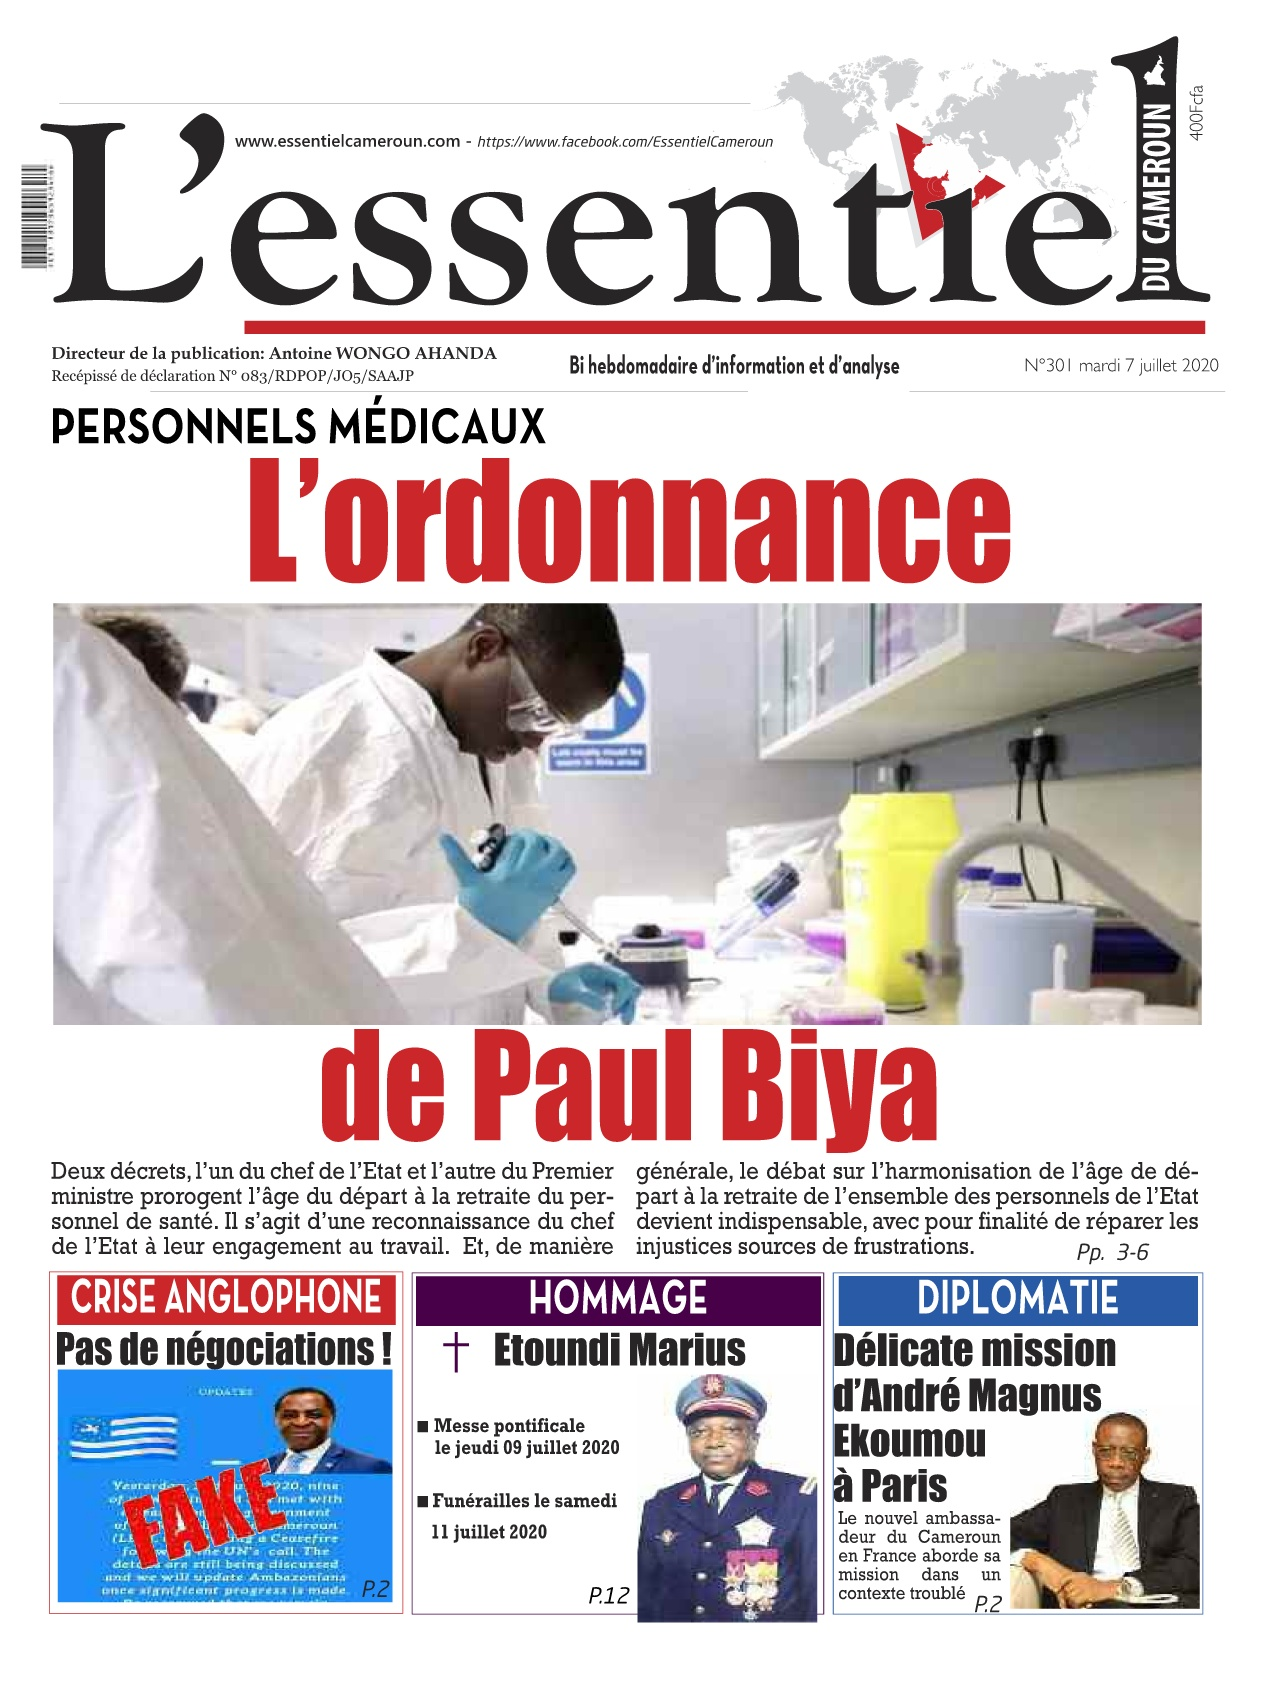 L'essentiel du Cameroun - 07/07/2020